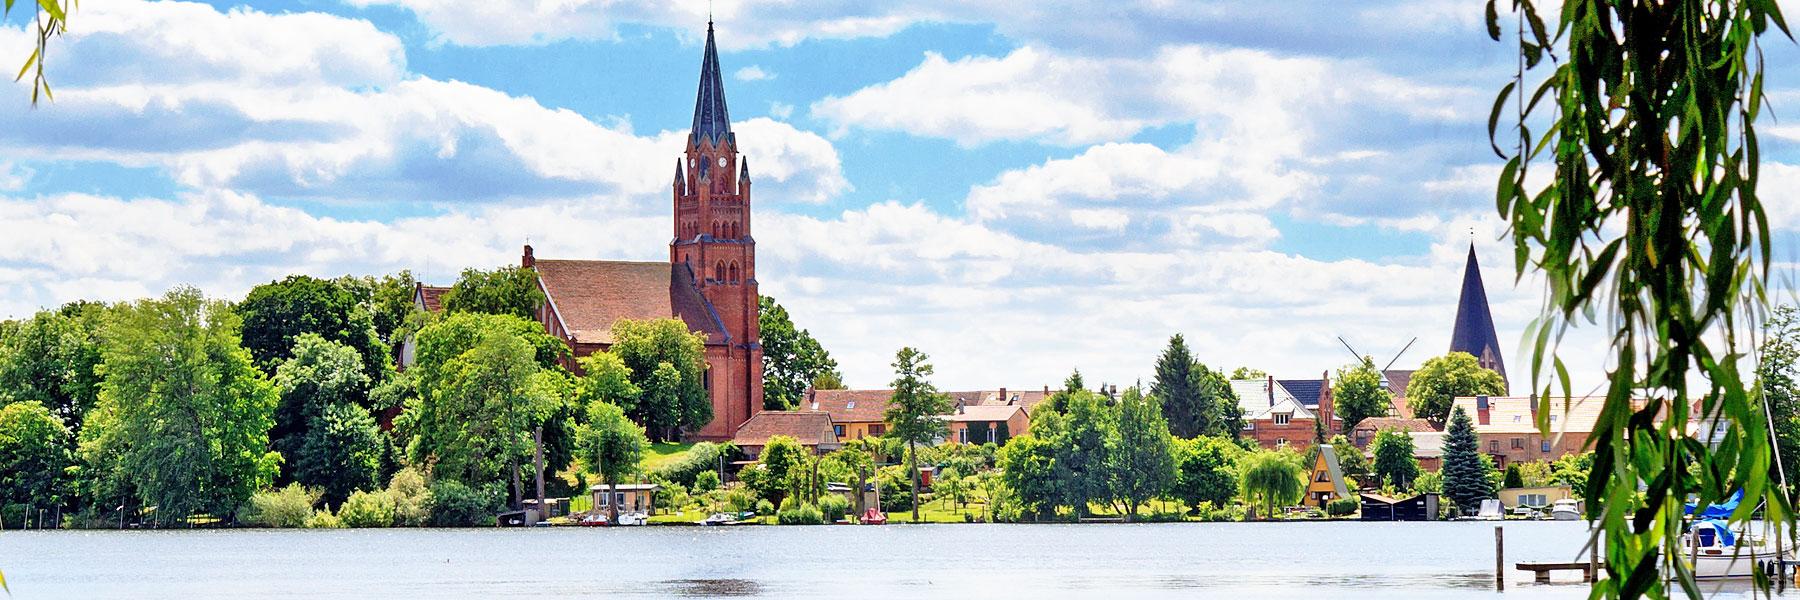 marienkirche müritzufer - Röbel/Müritz